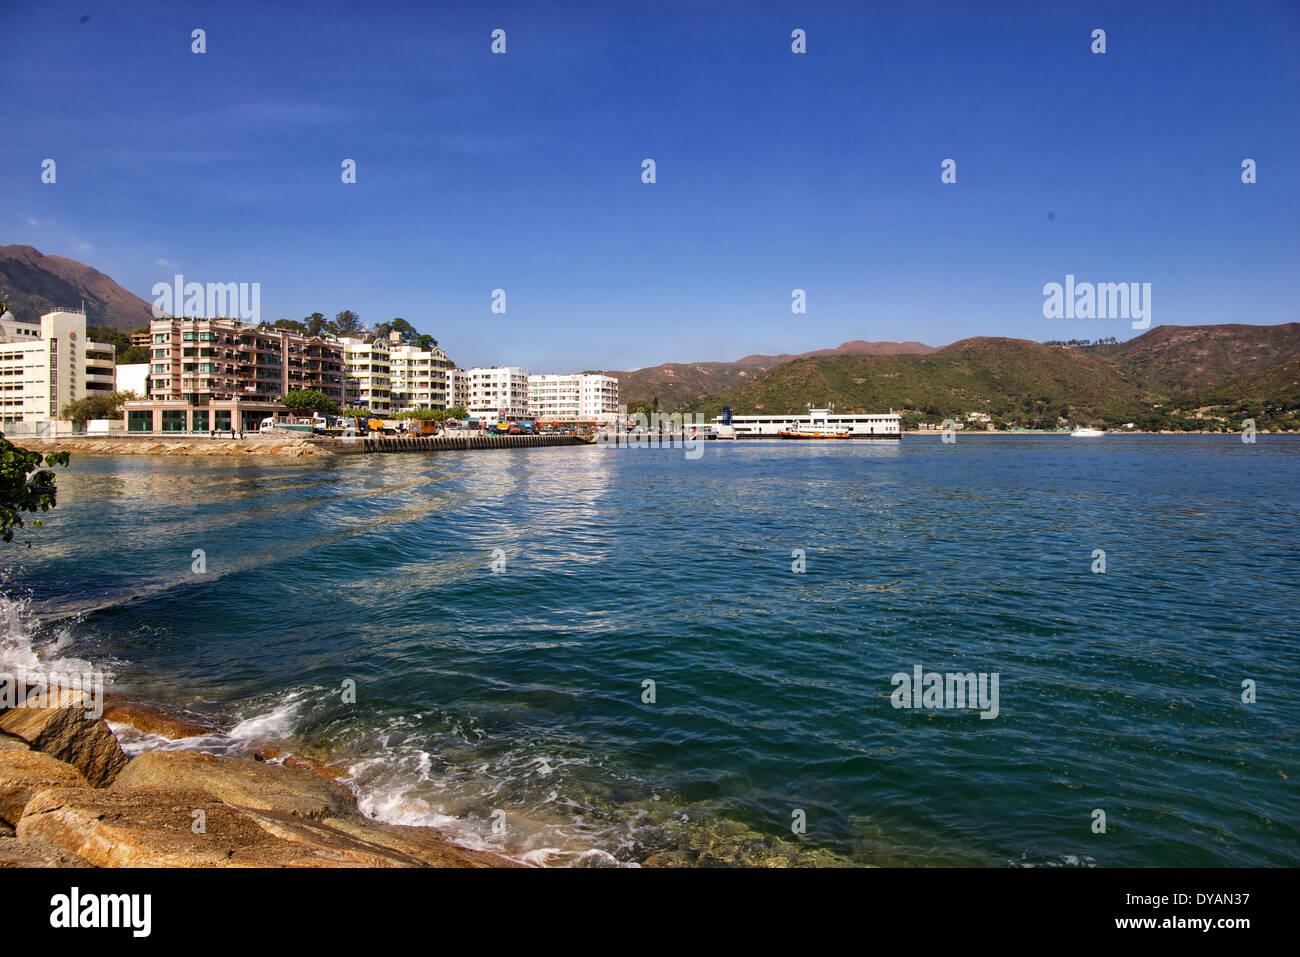 Hong Kong Lantau Island Mui Wo water front - Stock Image